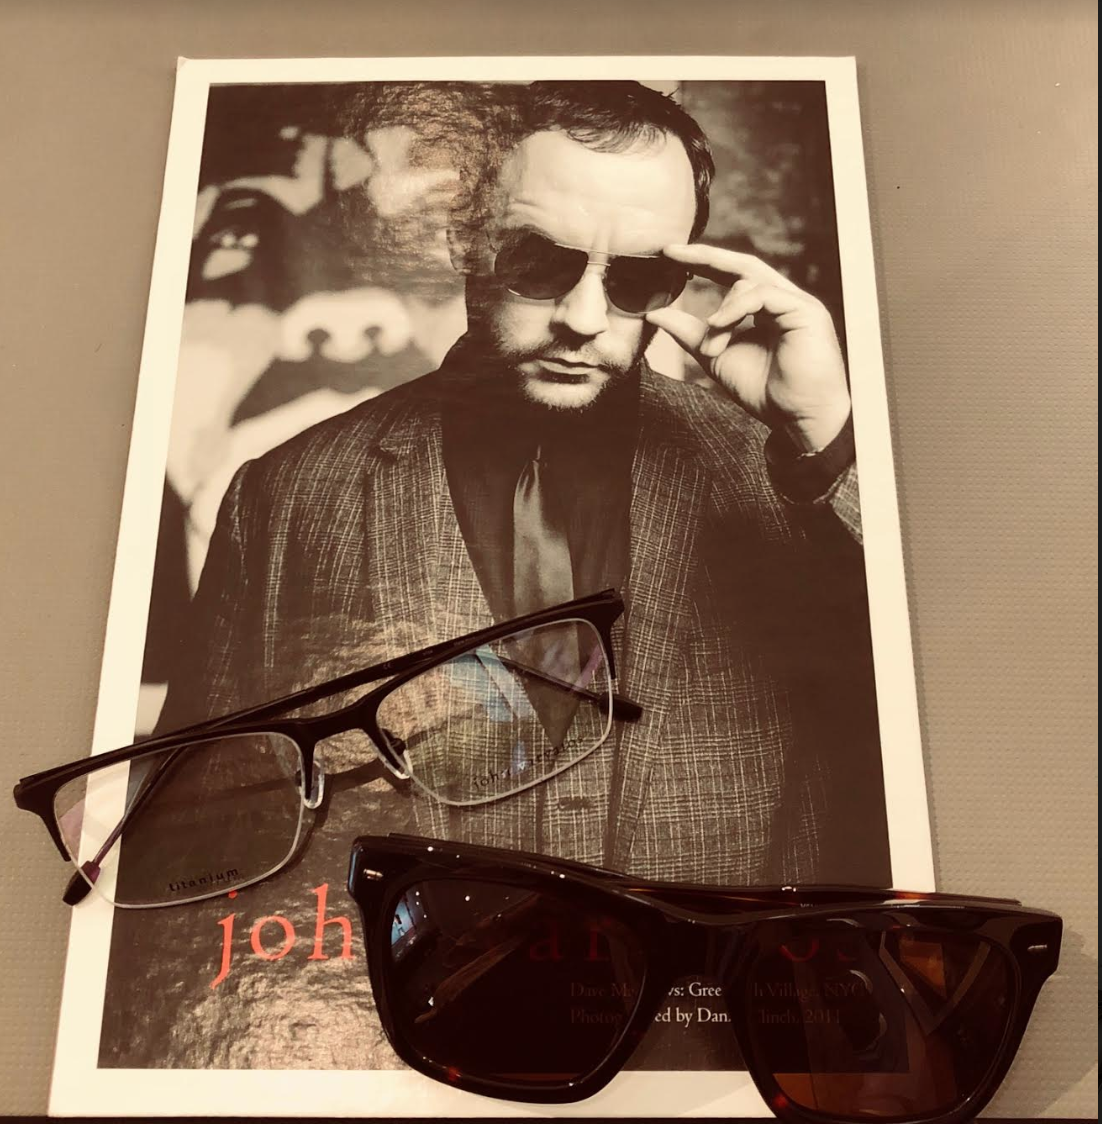 Jaguar Eyewear at Schatan Optical Gallery - Torrance, CA 90505